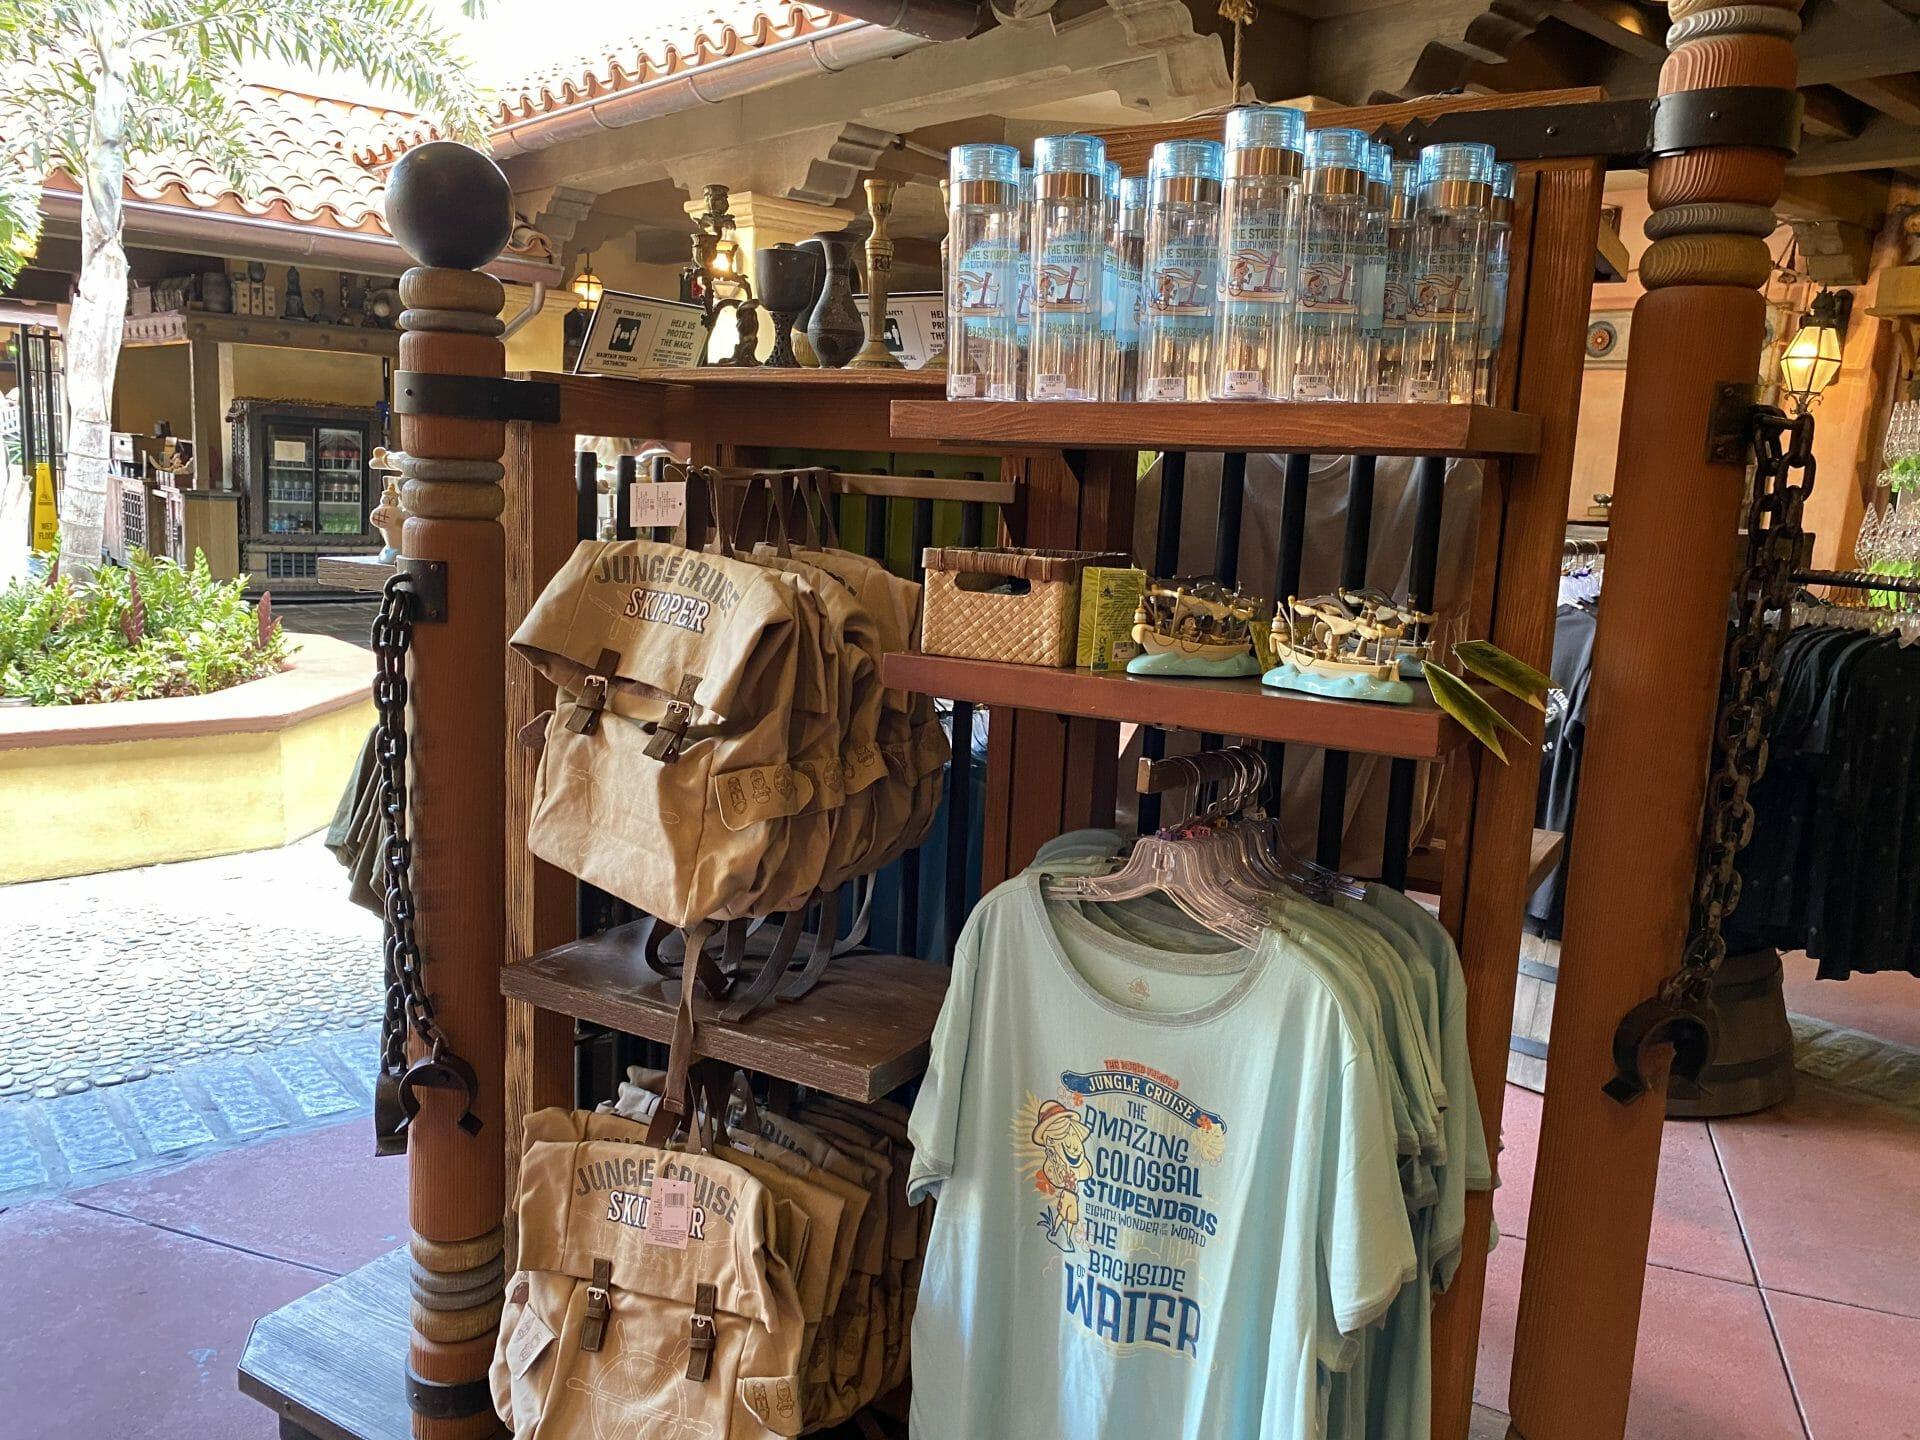 New Jungle Cruise Merchandise at Magic Kingdom